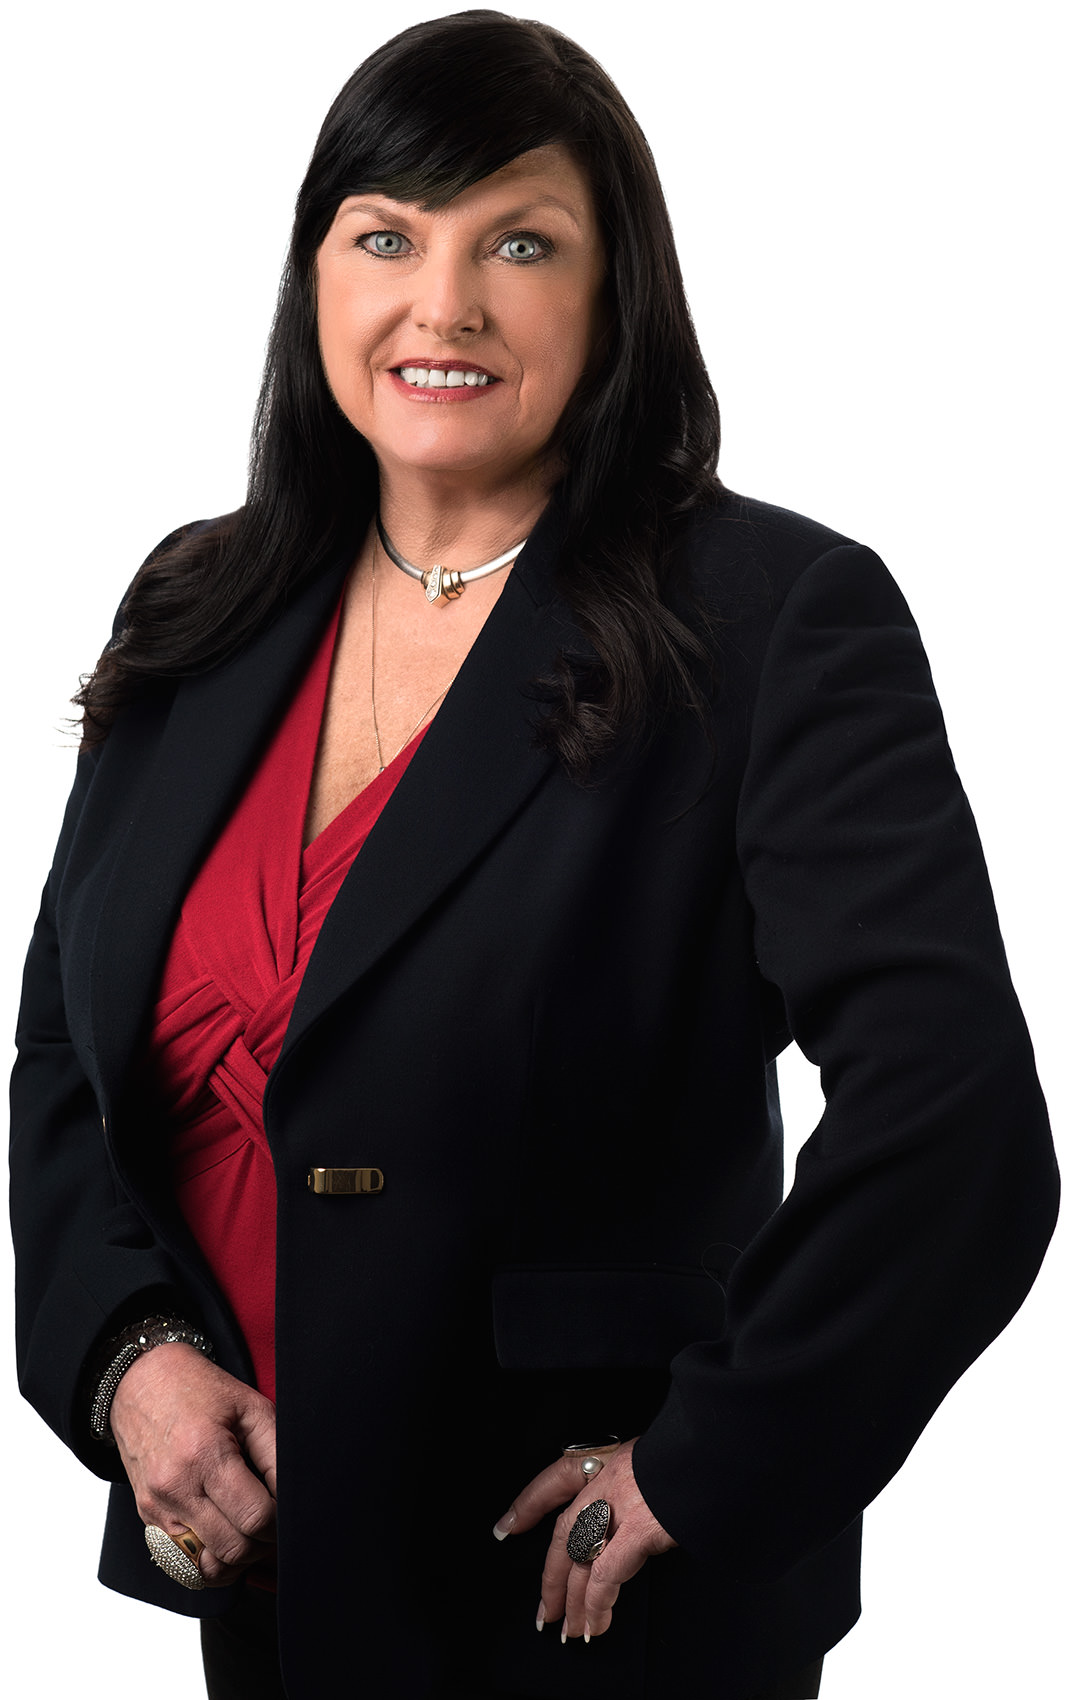 Karen Aldridge Crawford